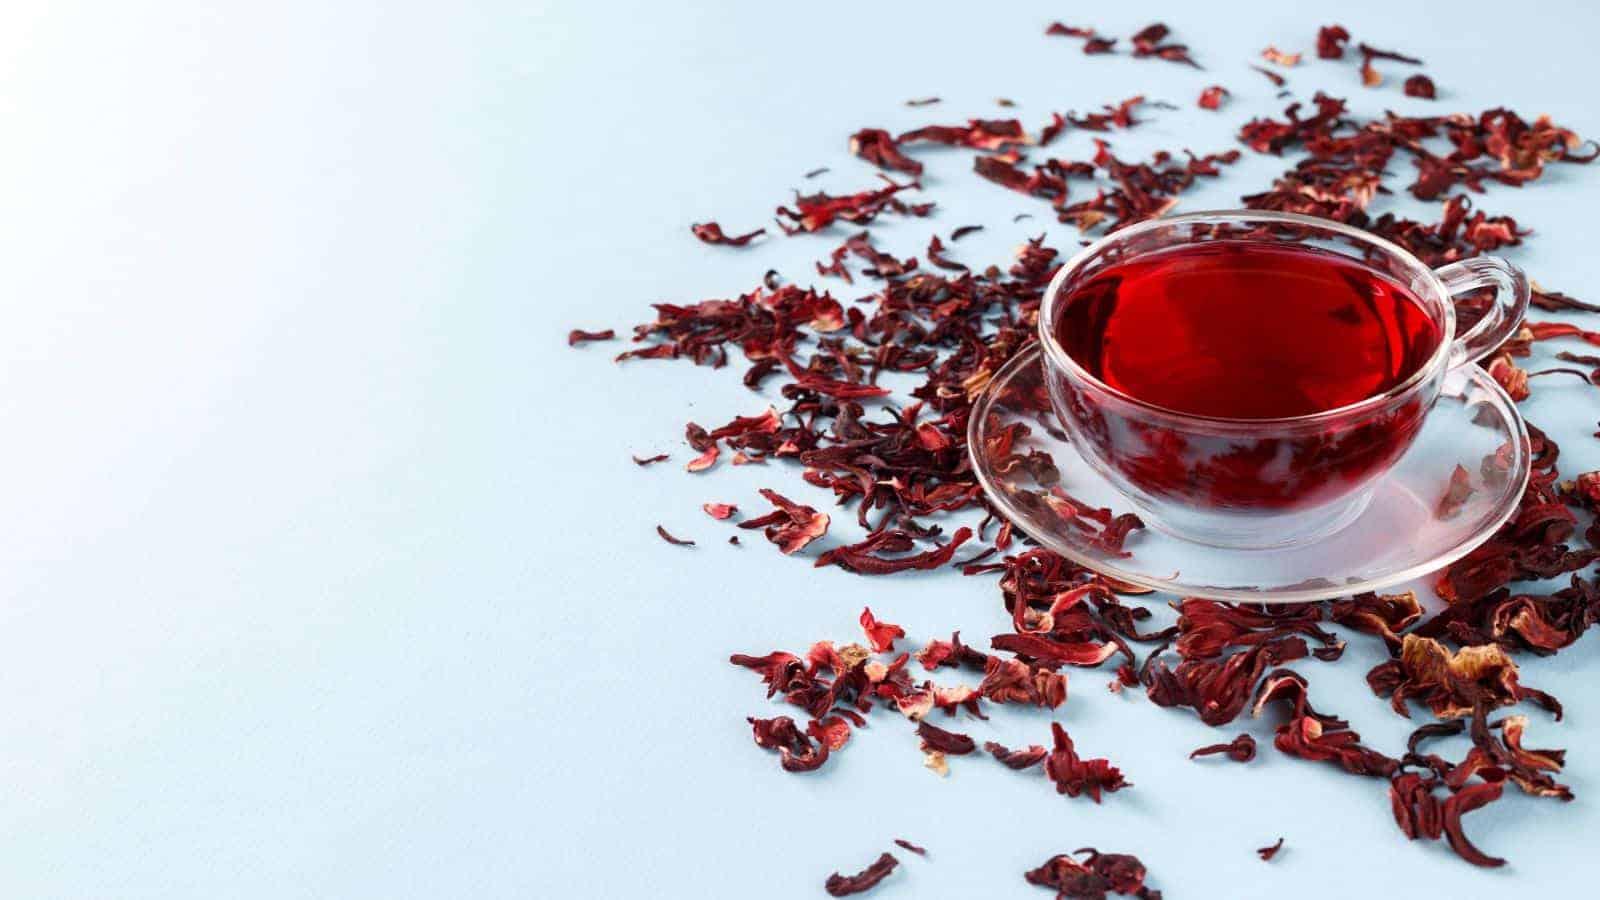 12 benefícios de beber chá de hibisco para nunca ignorar | Leitura de 5 minutos 1